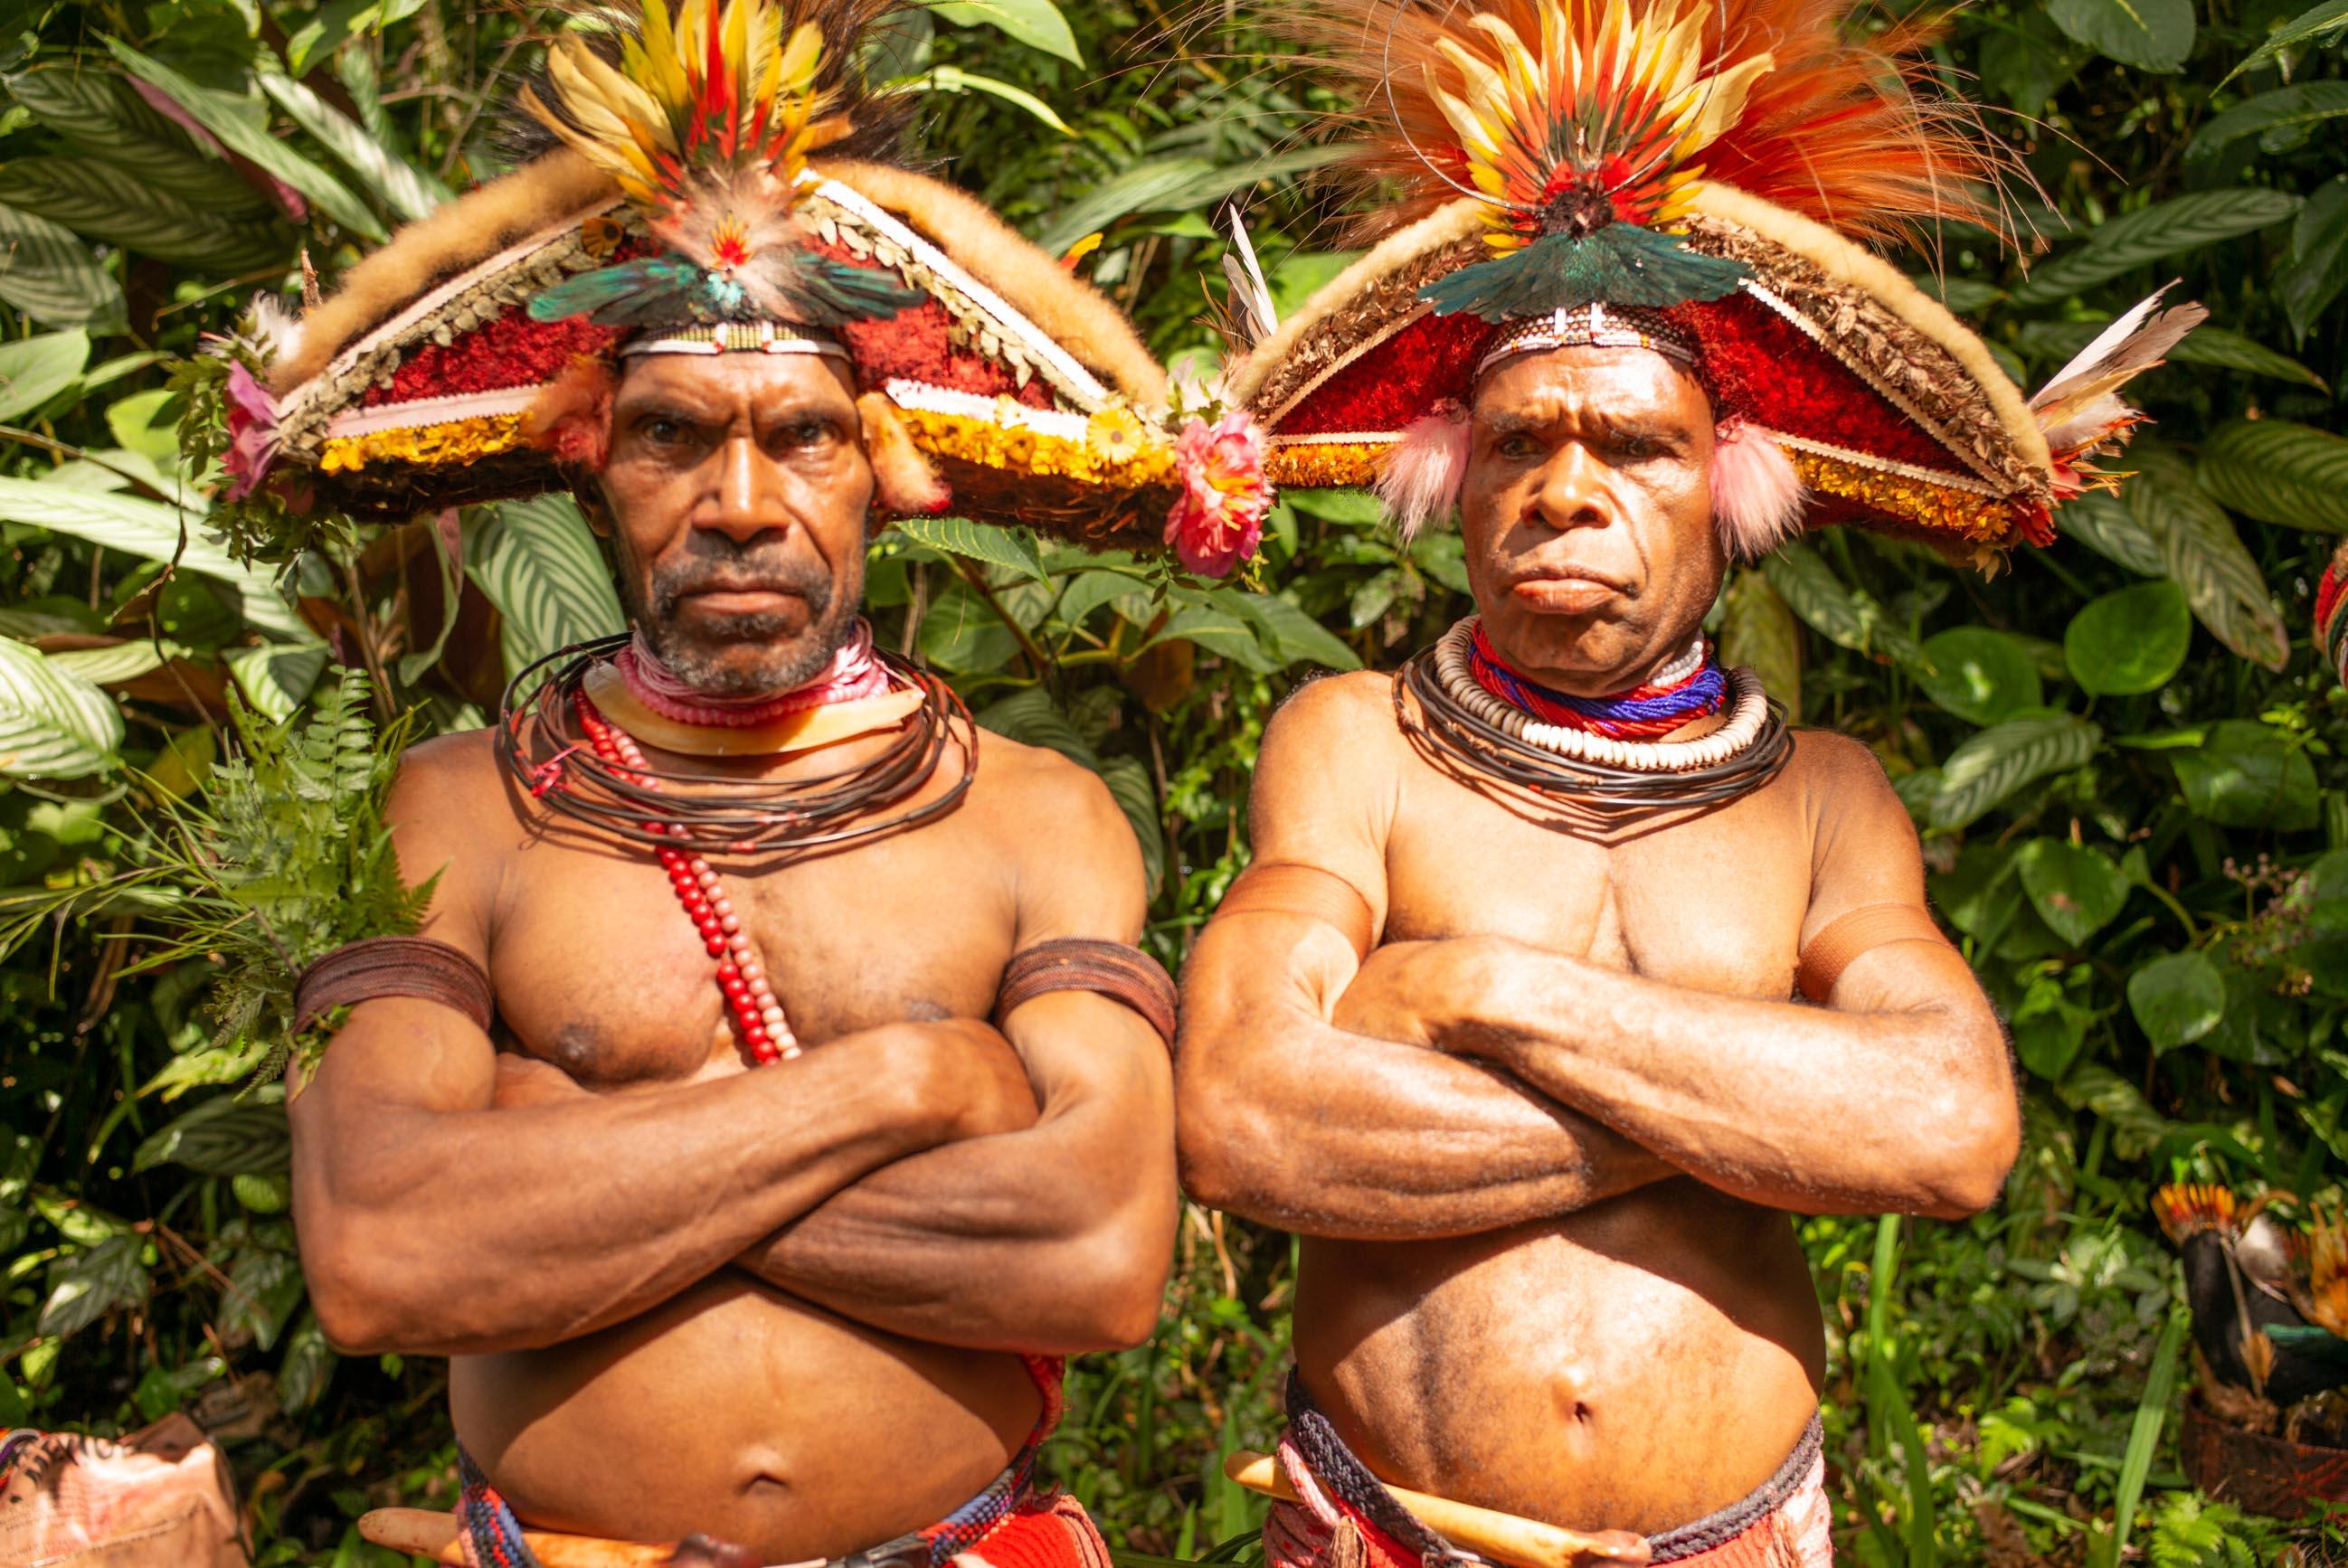 https://bubo.sk/uploads/galleries/7442/lubosfellner_papuanovaguinea_l1007819.jpg